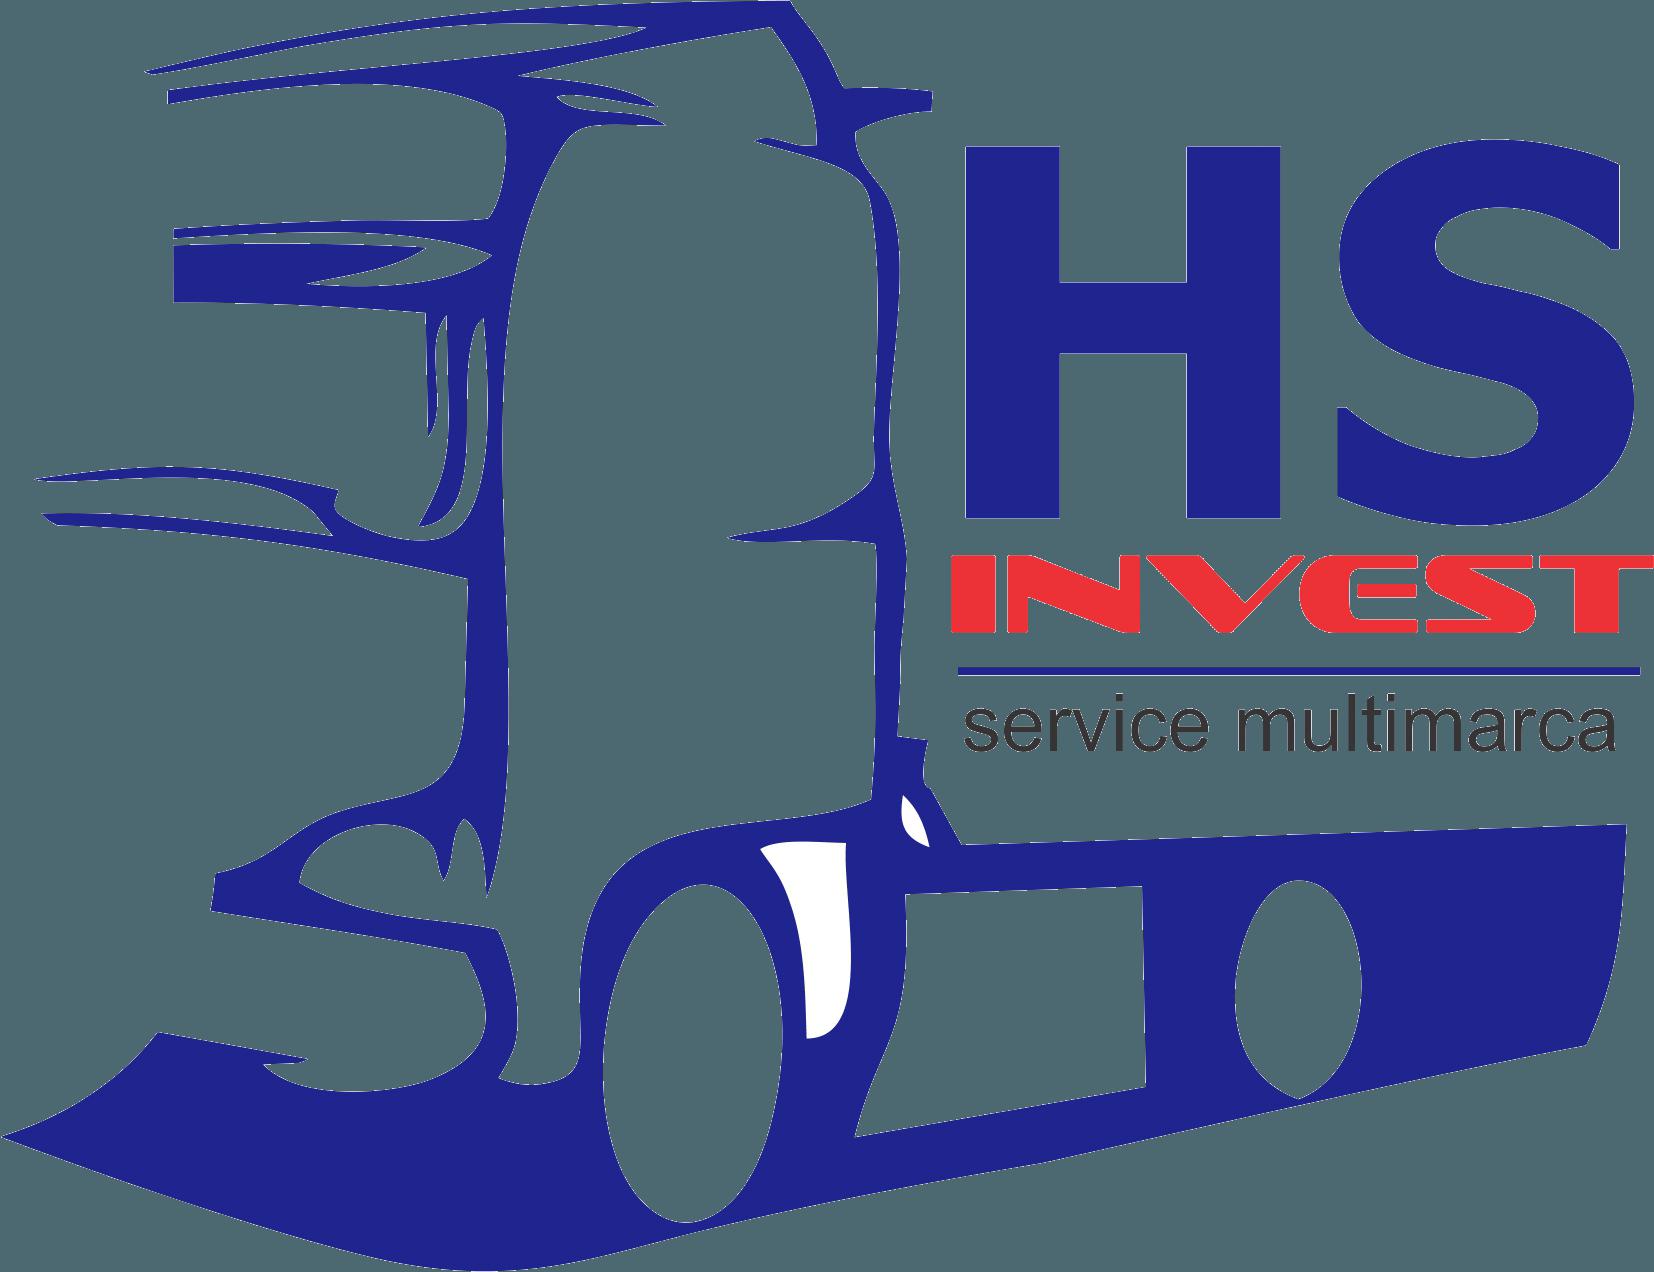 Service auto & camioane multimarca Sibiu – HS Invest